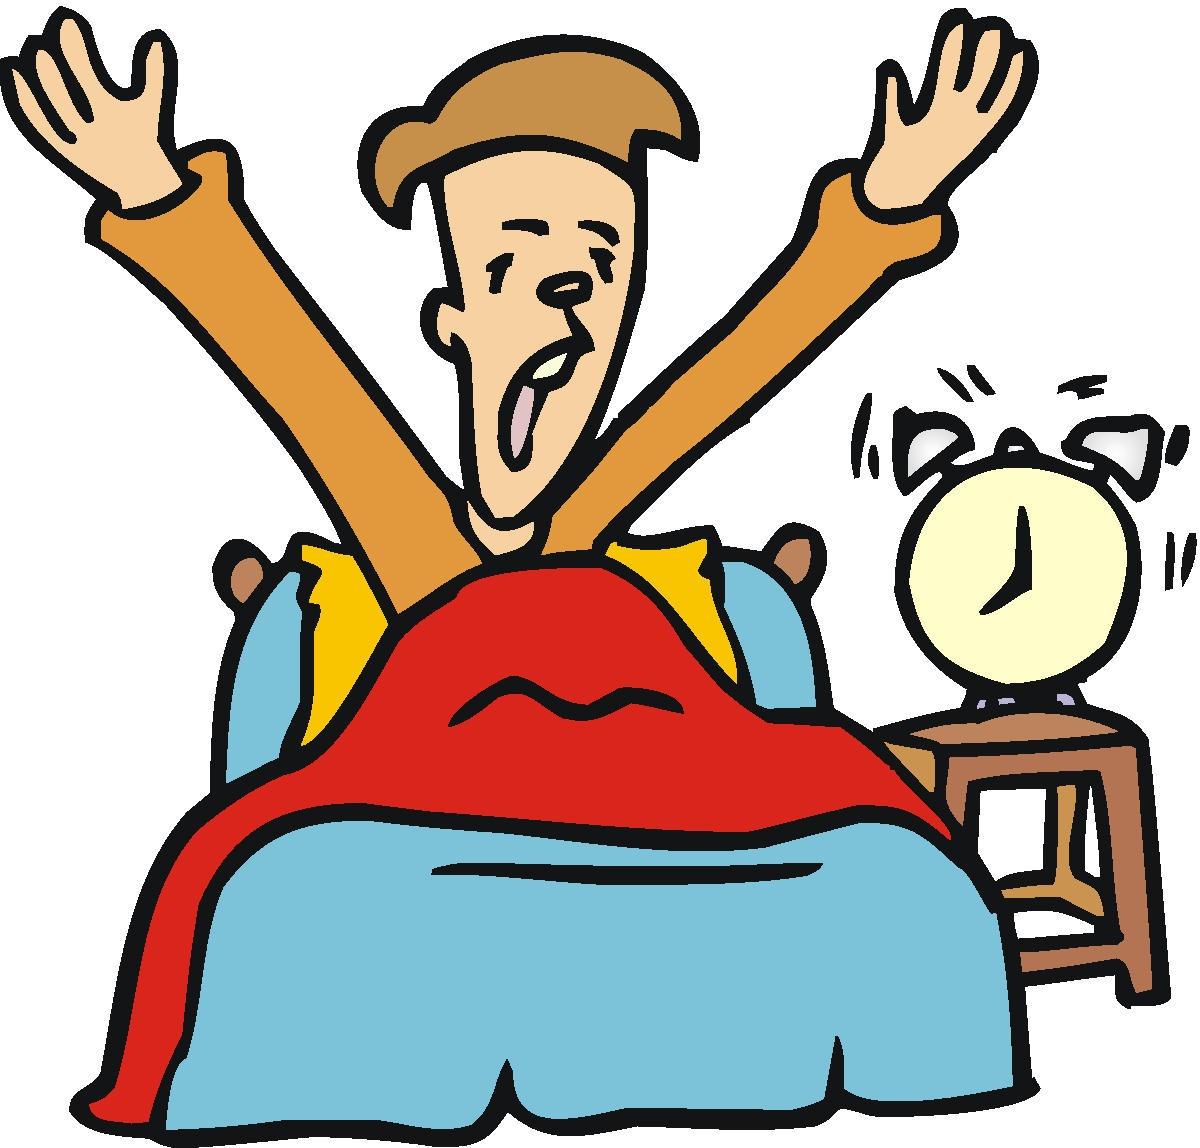 Of Quality Sleep So You Wake Up Refreshe-Of Quality Sleep So You Wake Up Refreshed And With Boundless Energy-6